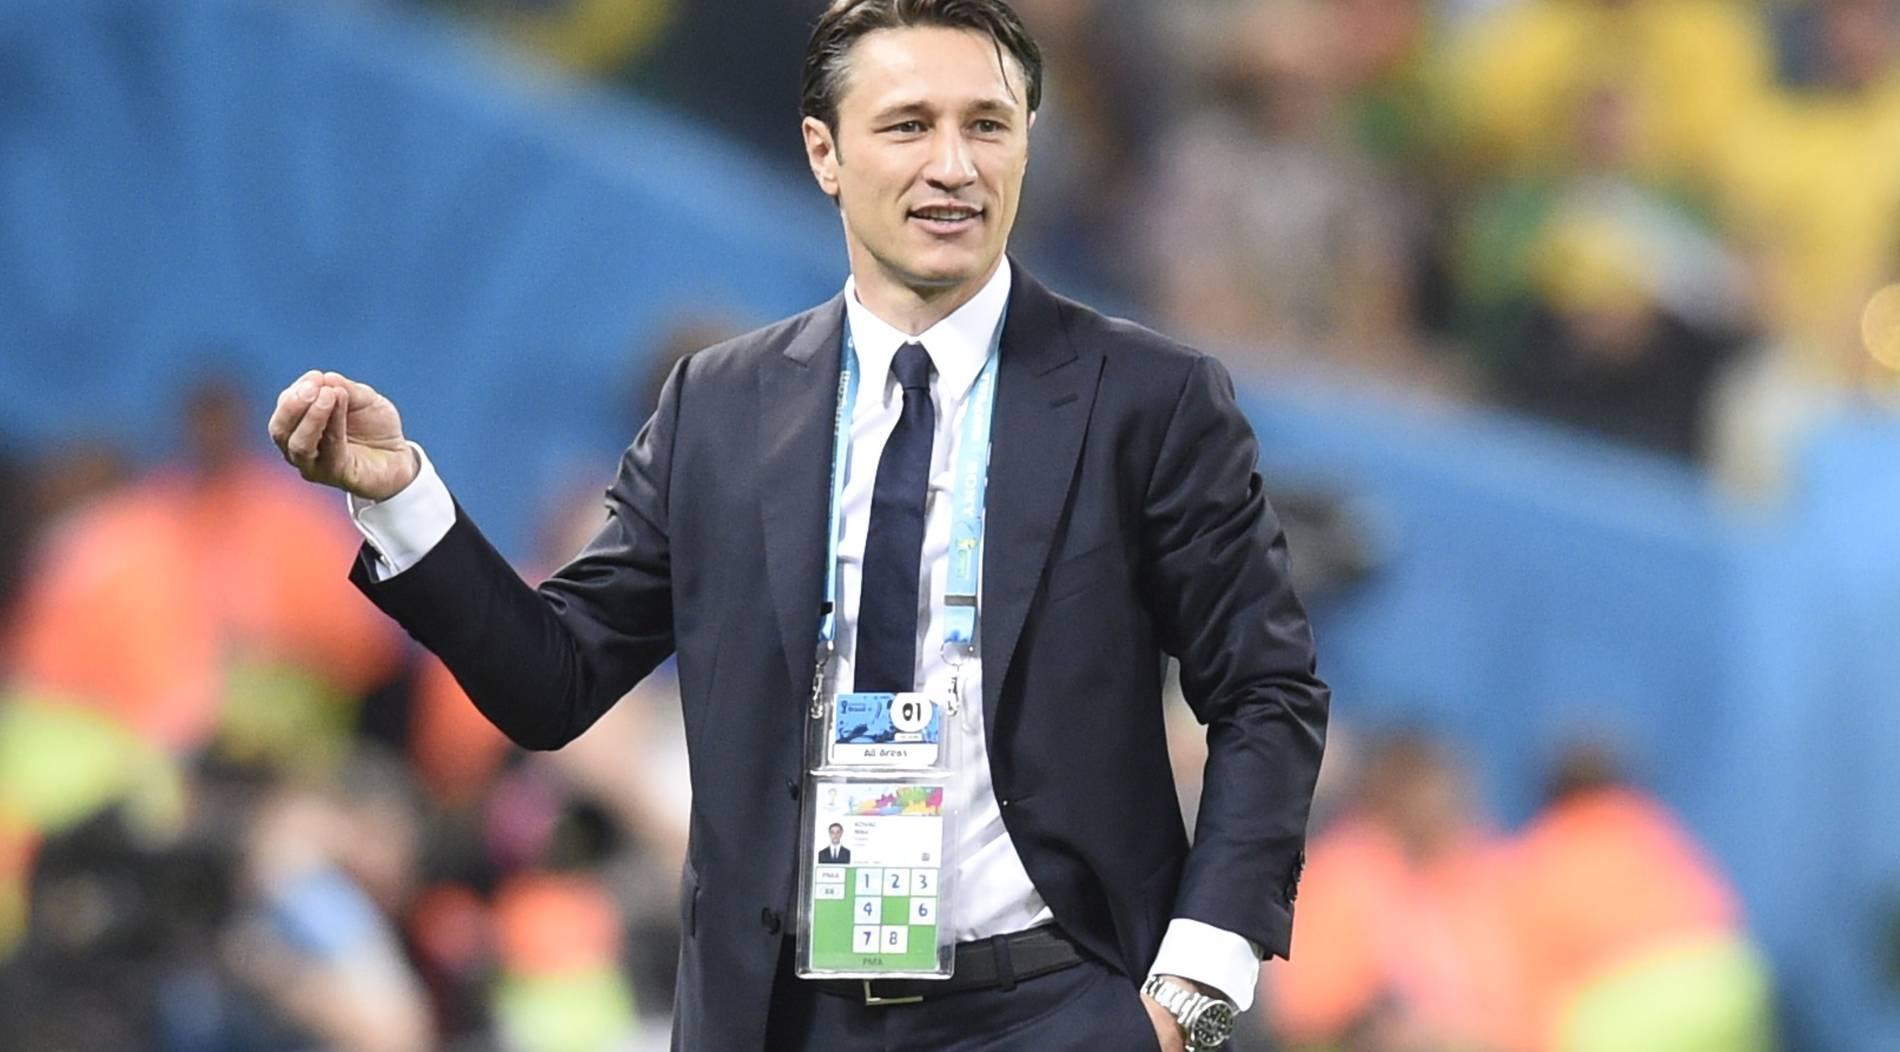 Kovac droht Rauswurf trotz Titel